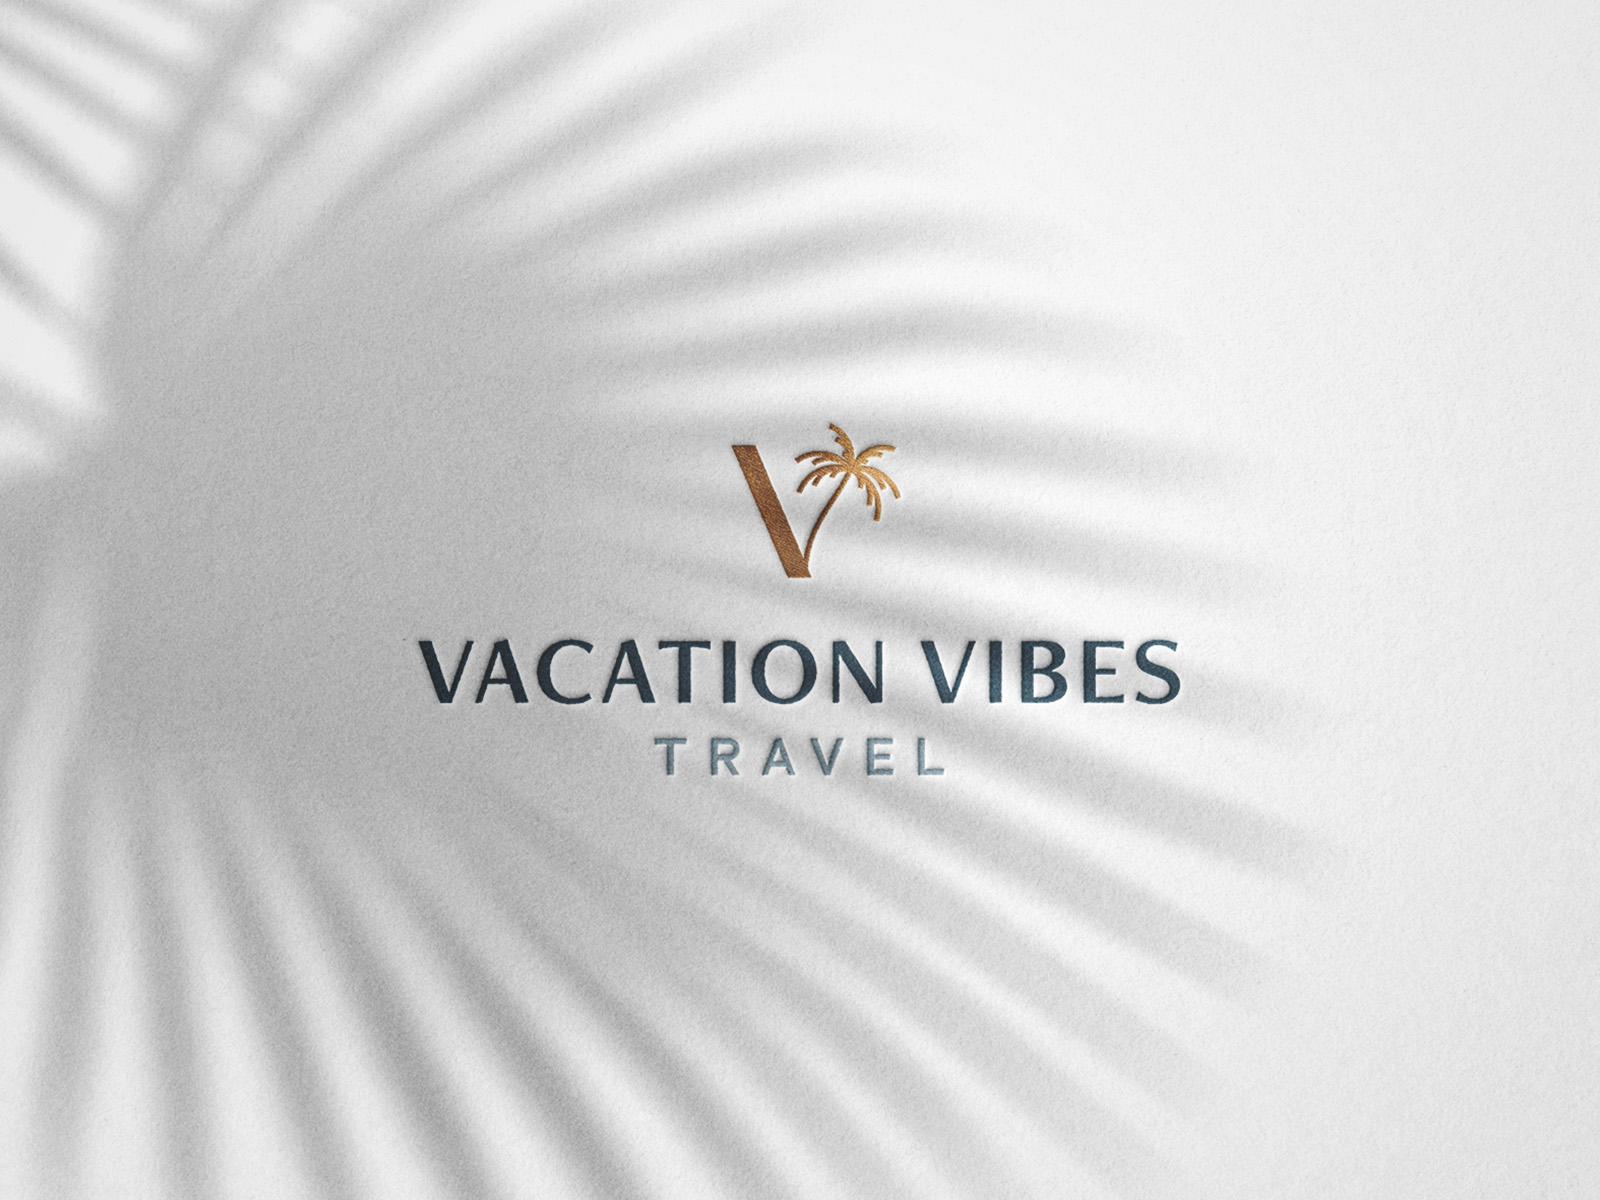 Vacation Vibes Travel | Brand Identity